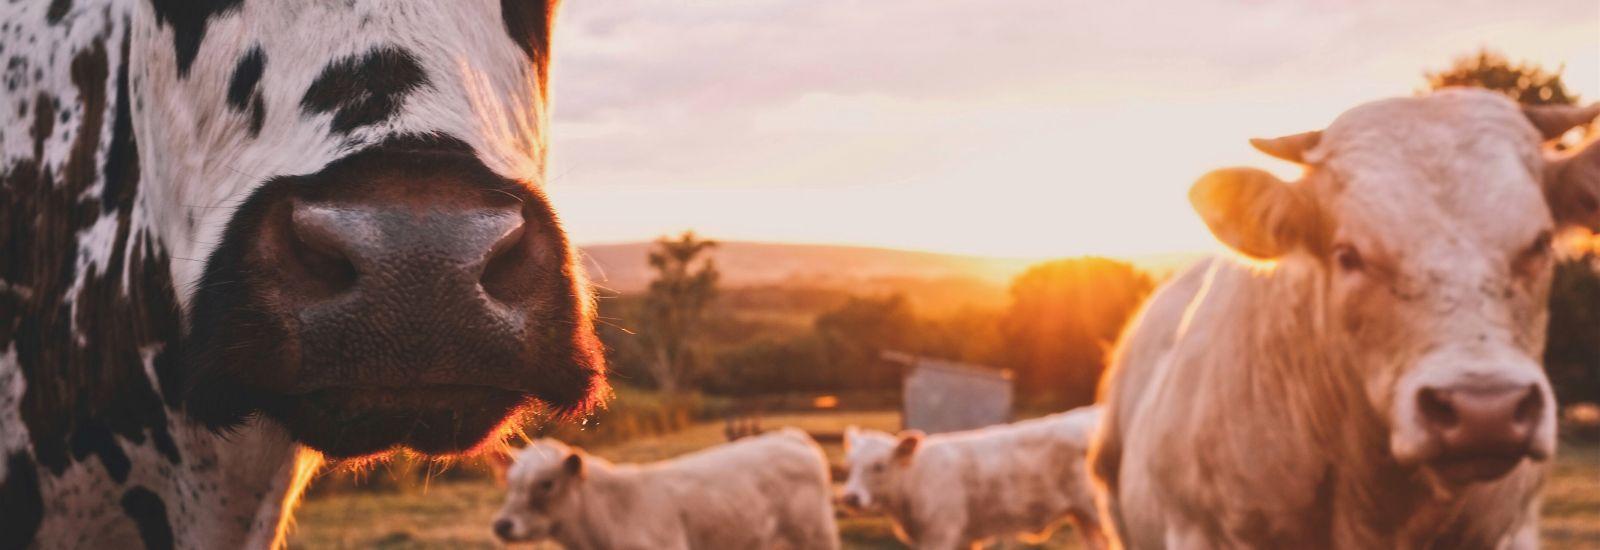 A herd of cows in a field